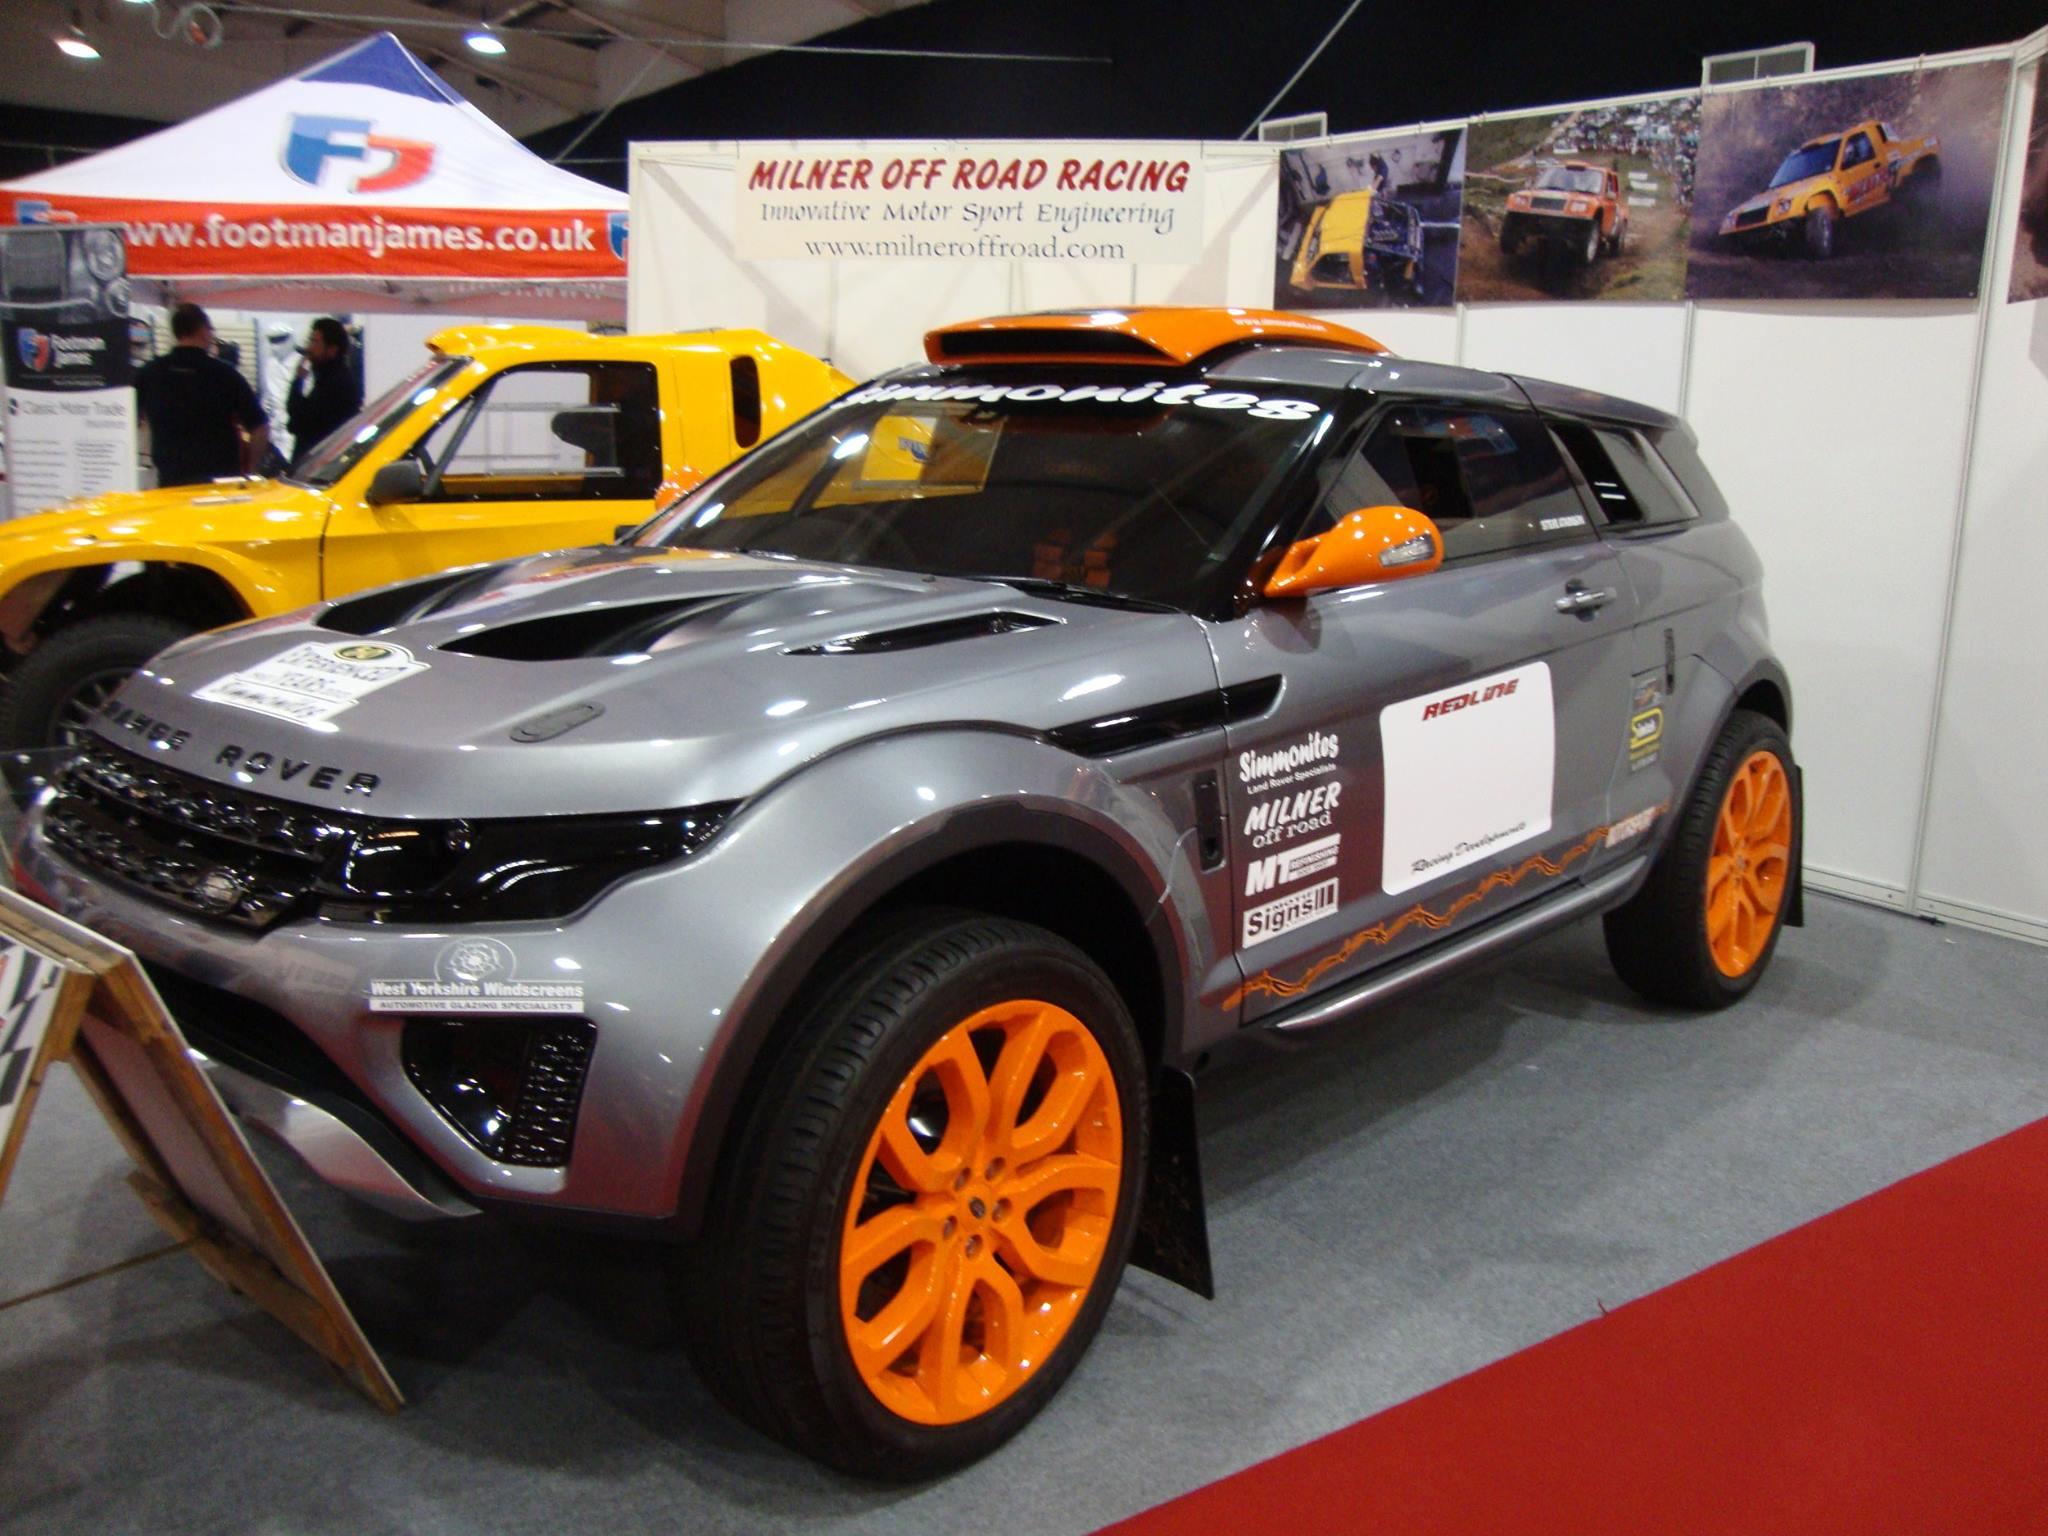 Subaru Custom Cars New Upcoming 2019 2020 Venom 400 Wiring Diagram Evoque Off Road Racer Has 62 Liter Rear